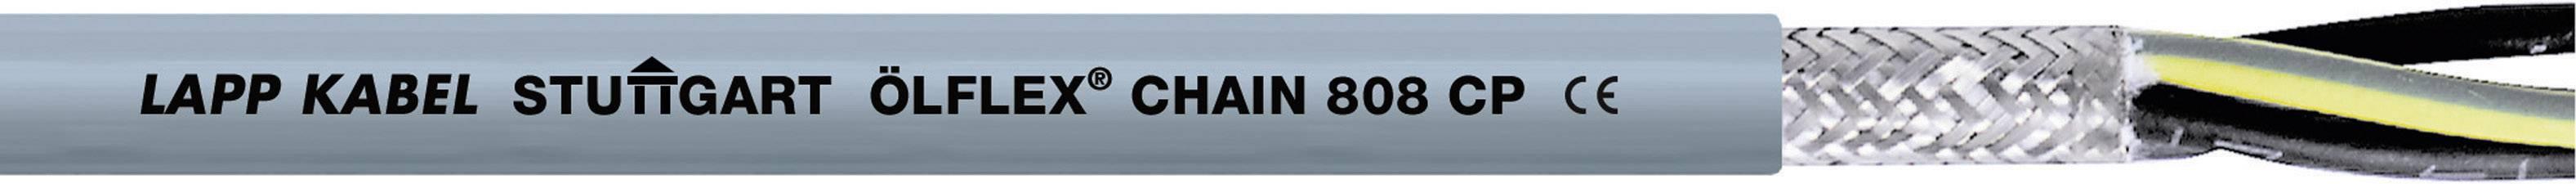 Žíla kabelu LappKabel ÖLFLEX CHAIN 808 CP 18G0,75 (1027765), 18x 0,75 mm², polyurethan, Ø 13 mm, stíněný, 50 m